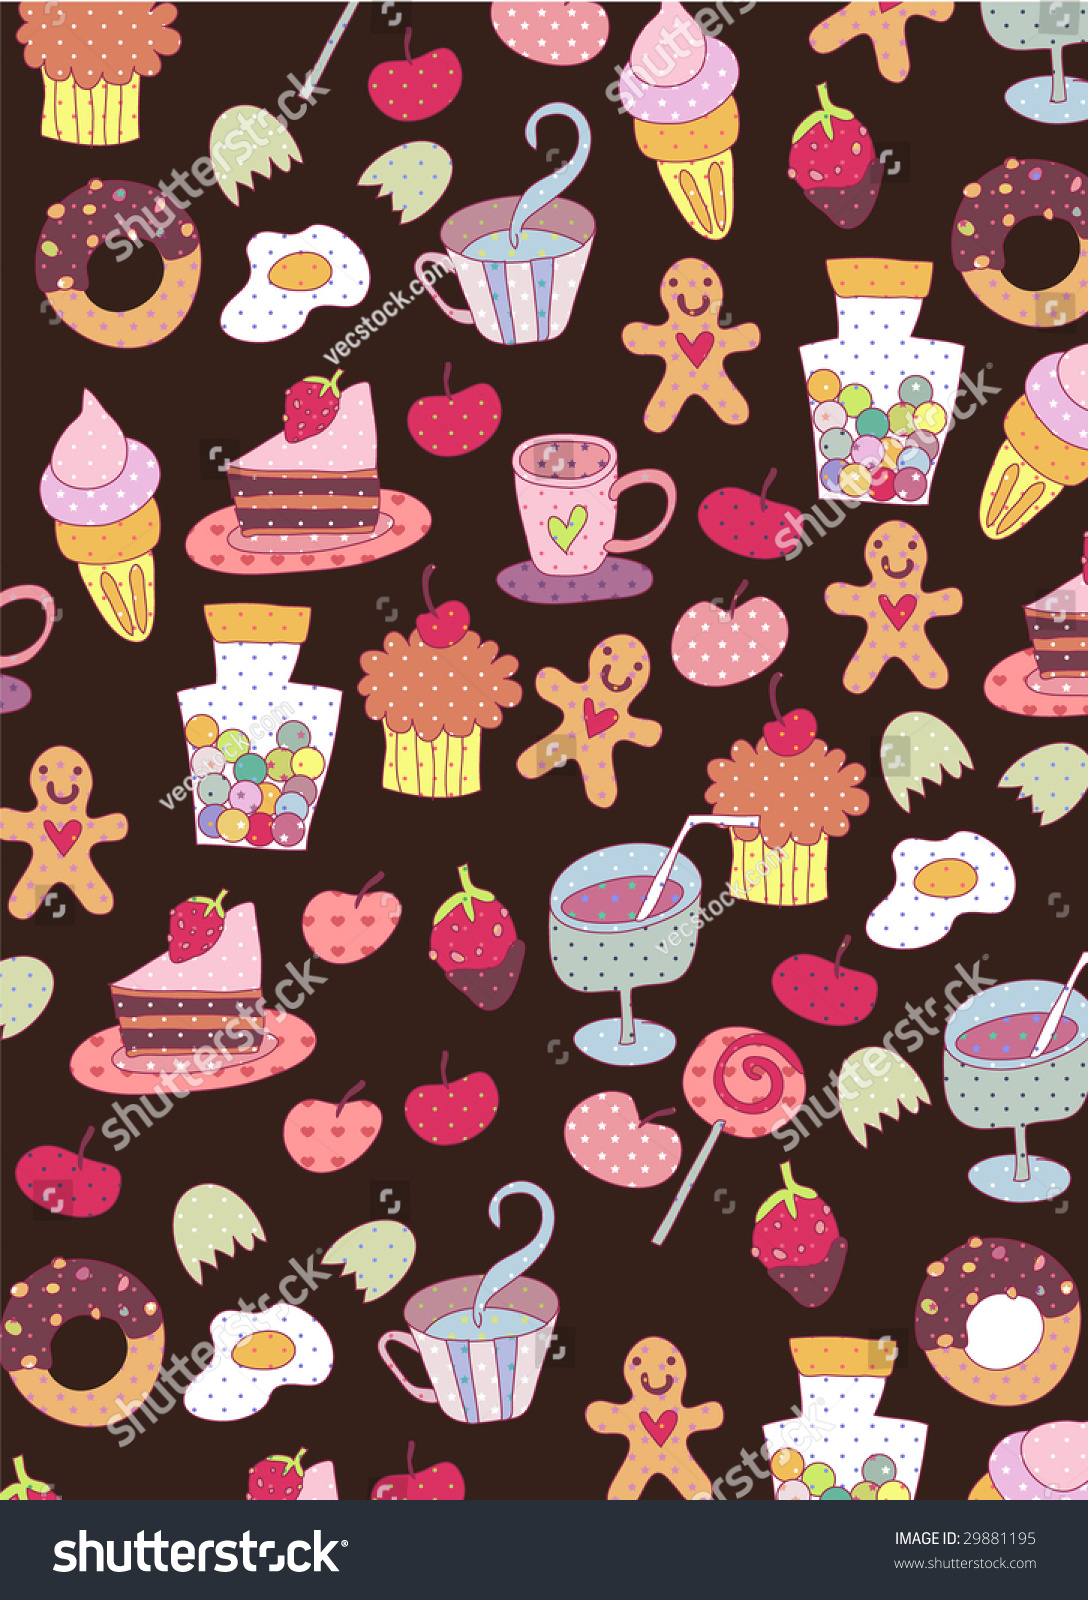 Cute Food Wallpaper Design Stock Vector 29881195